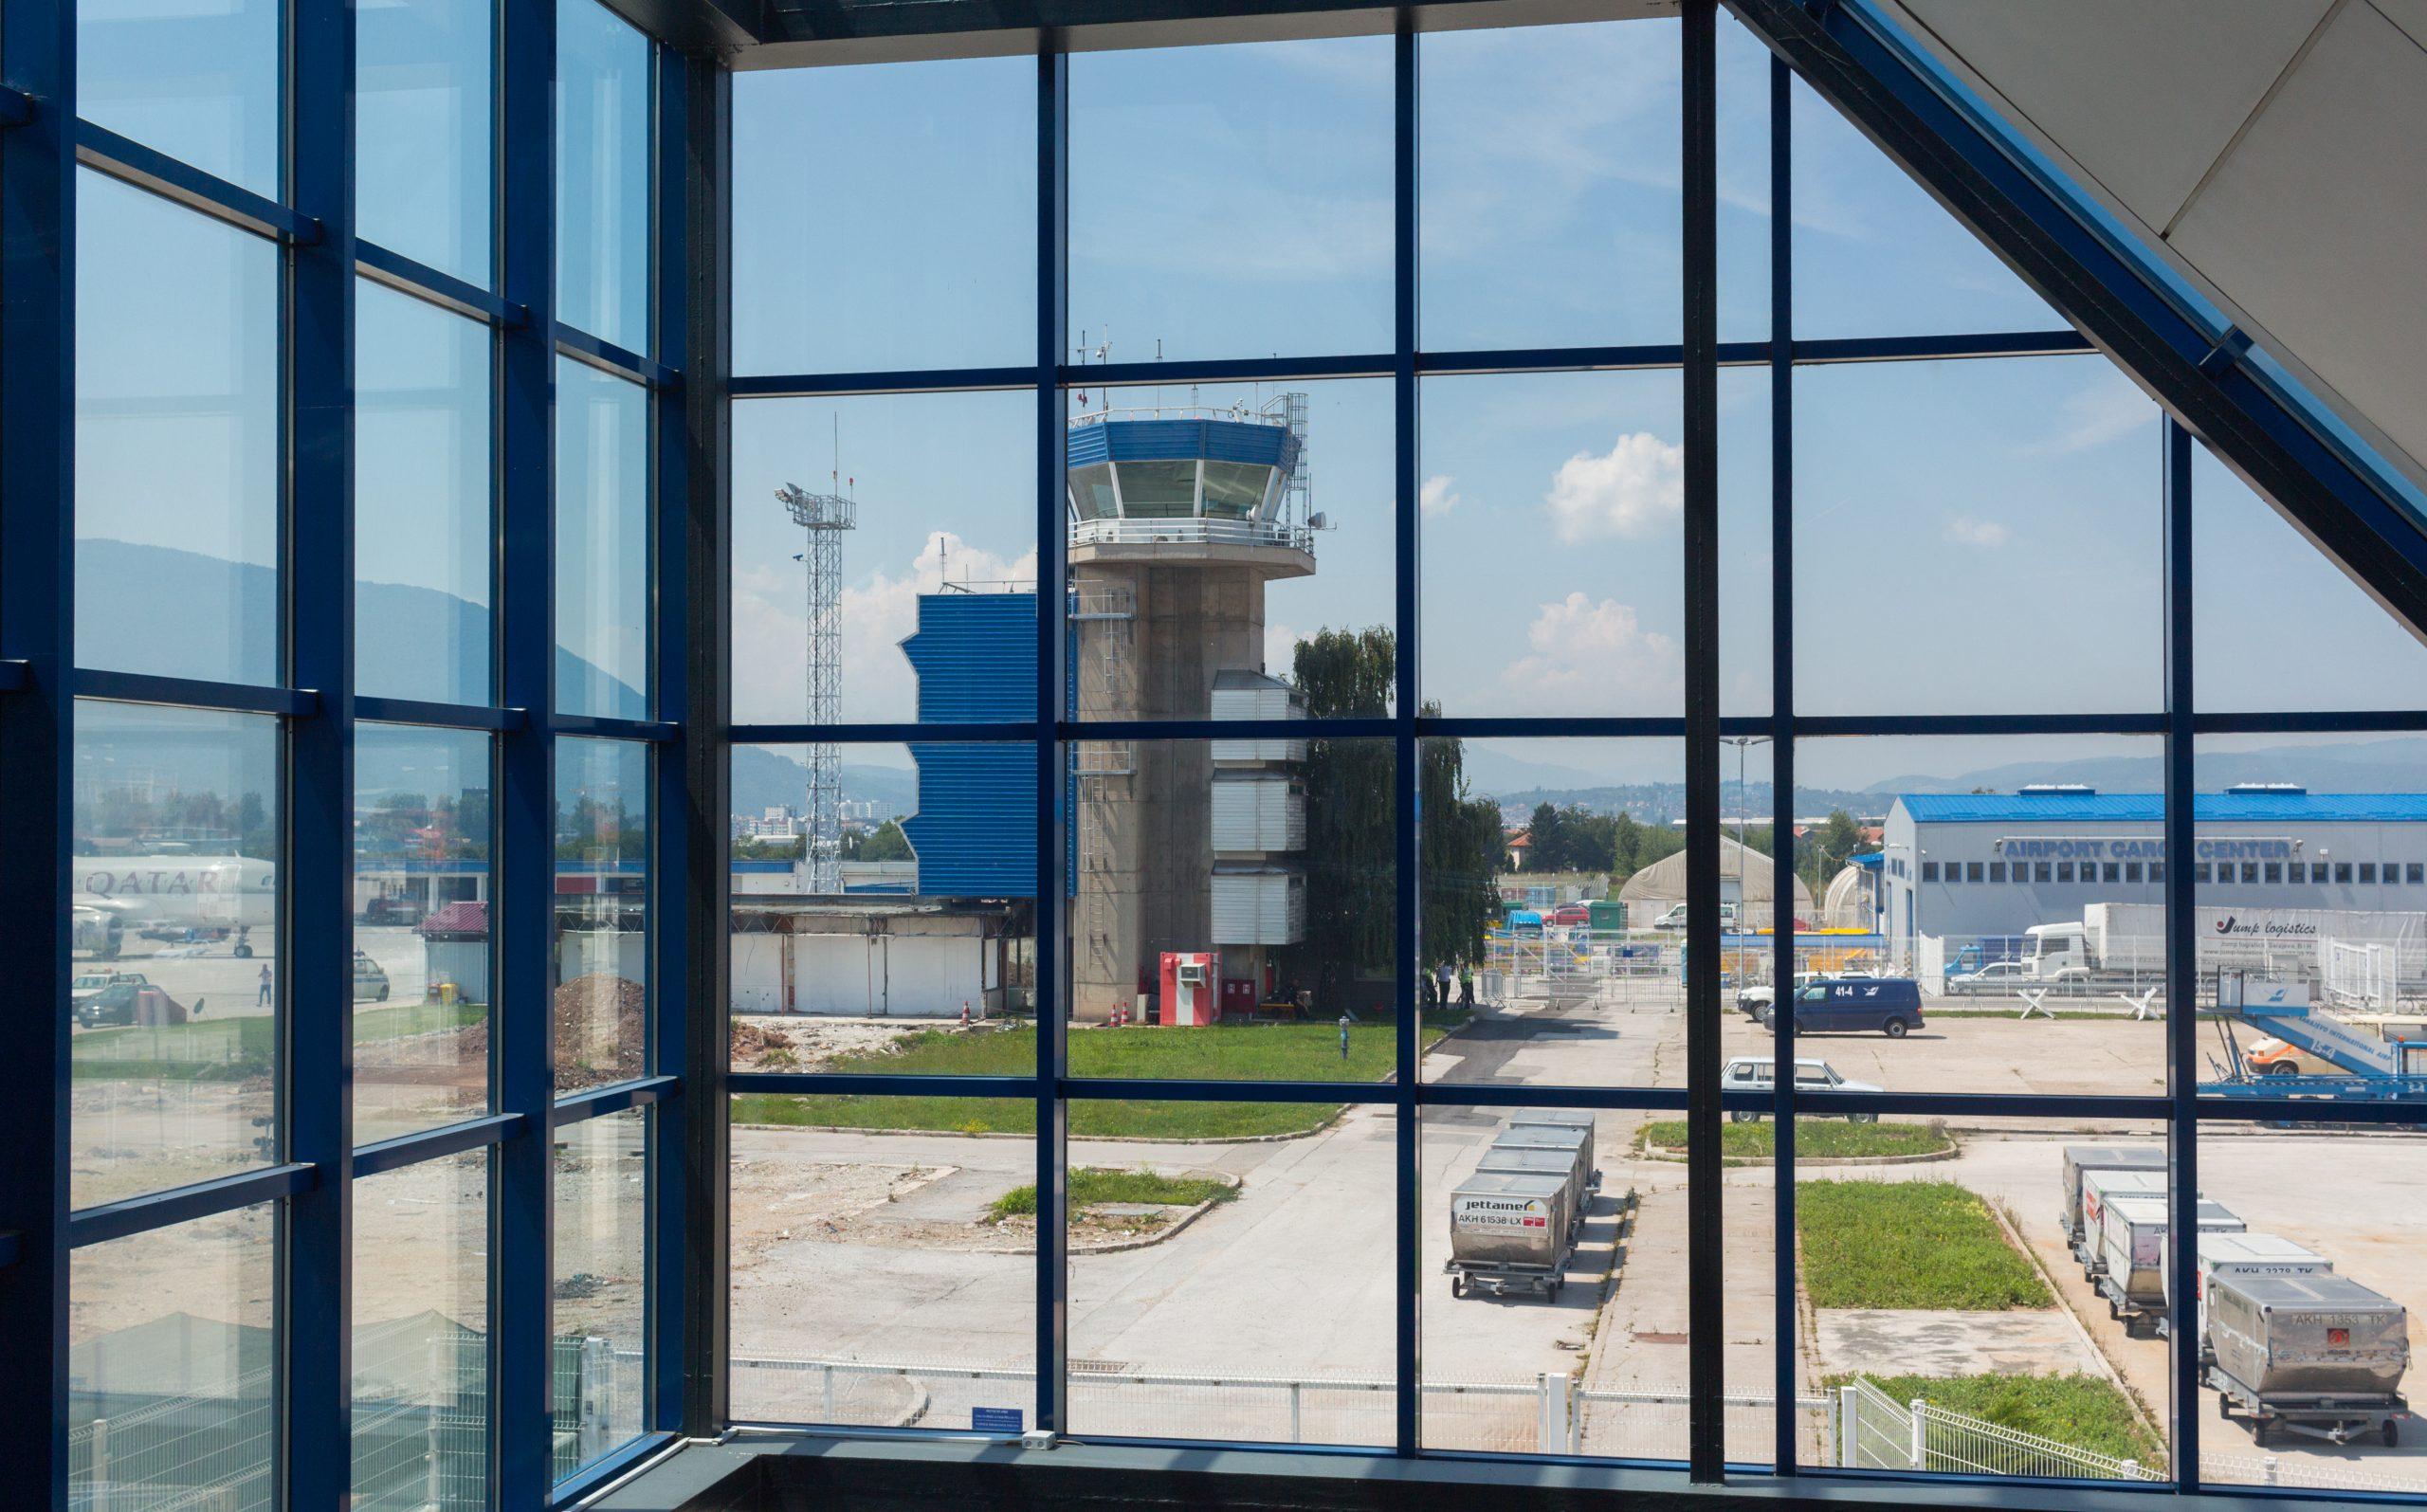 Kontroltårnet i Sarajevo International Airport. (Foto: Alekk Pires | shutterstock)